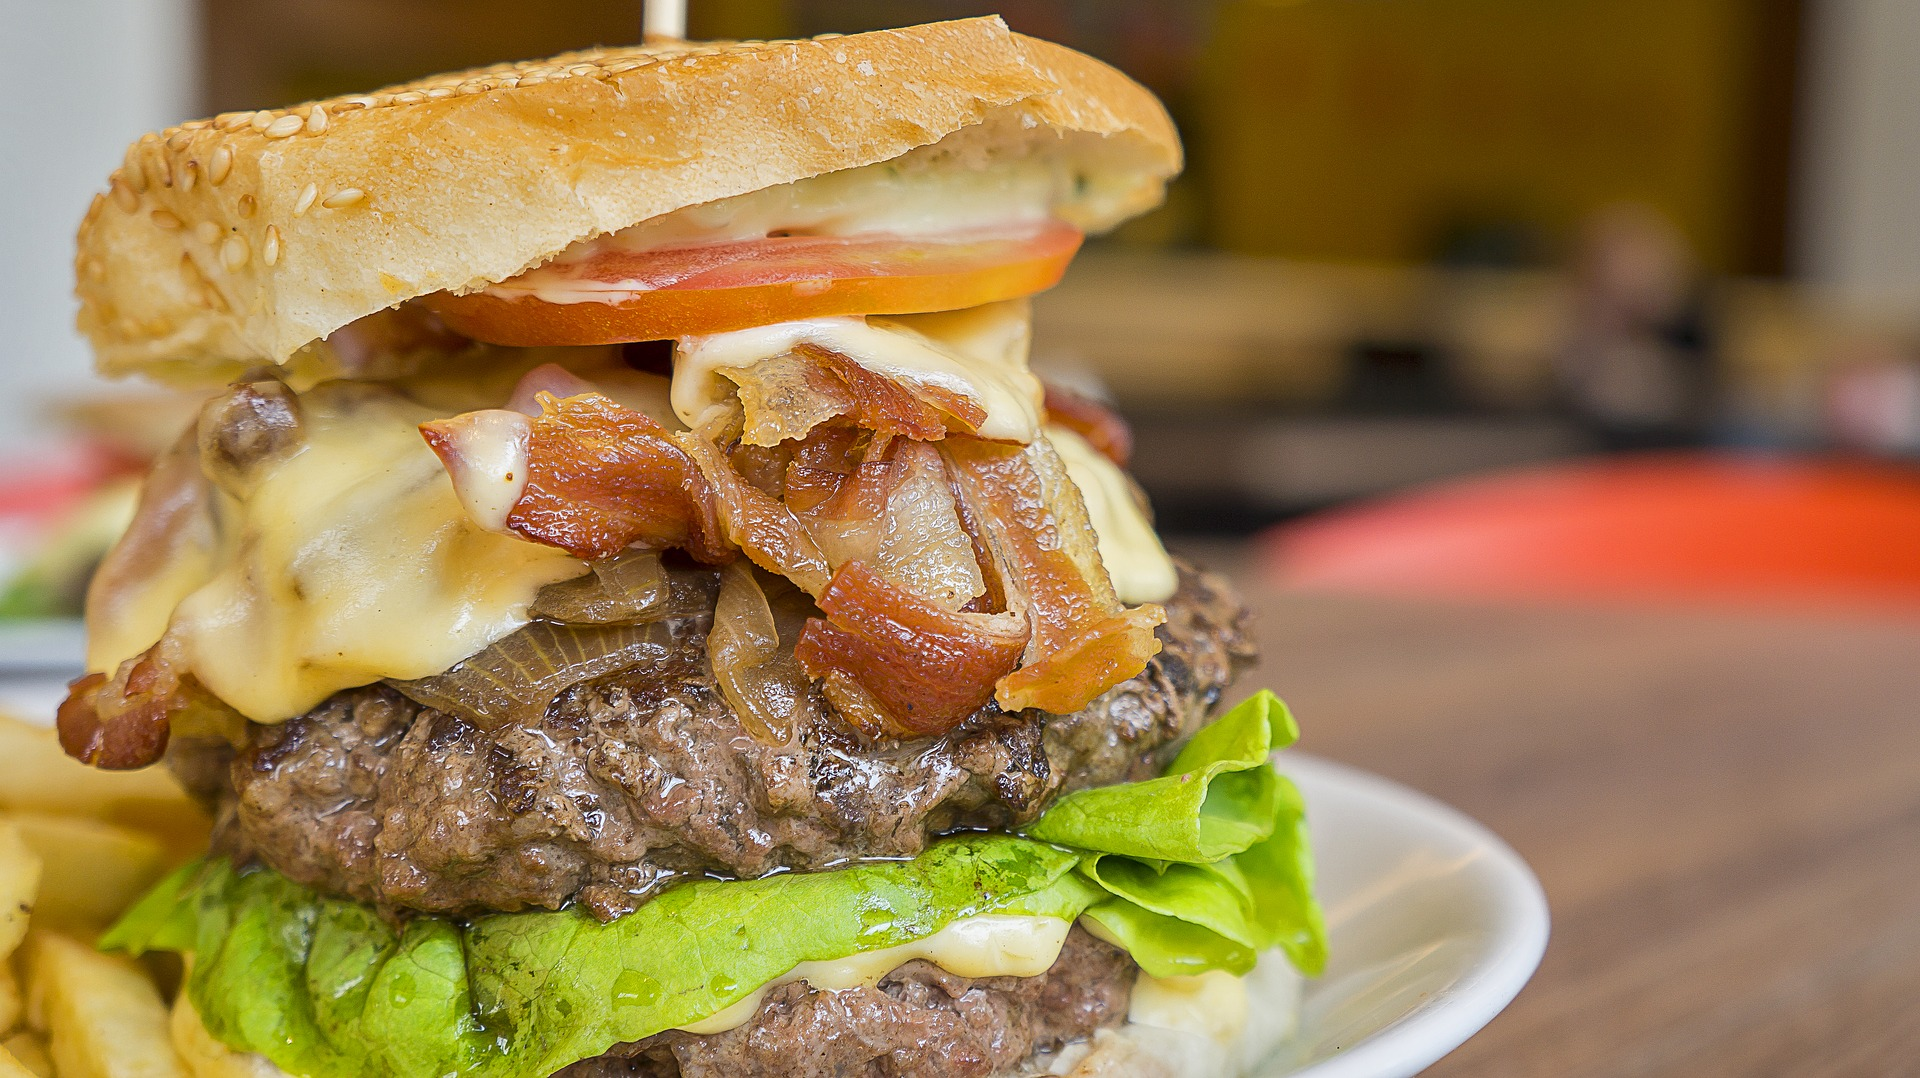 burger-1553287_1920.jpg